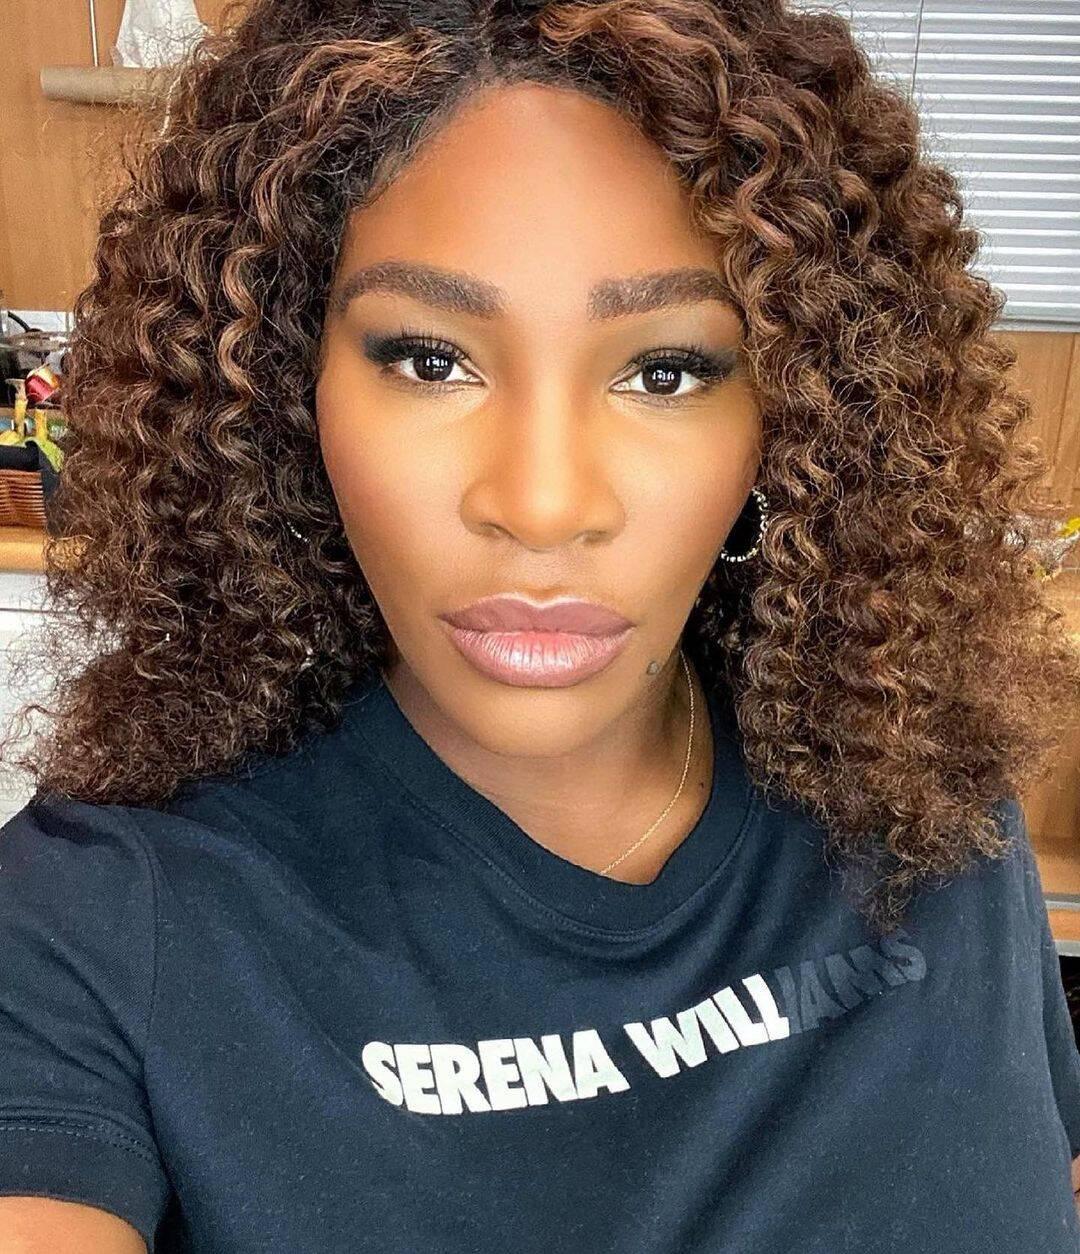 A tenista Serena Williams recebeu US$ 41,5 milhões (Foto: Instagram)